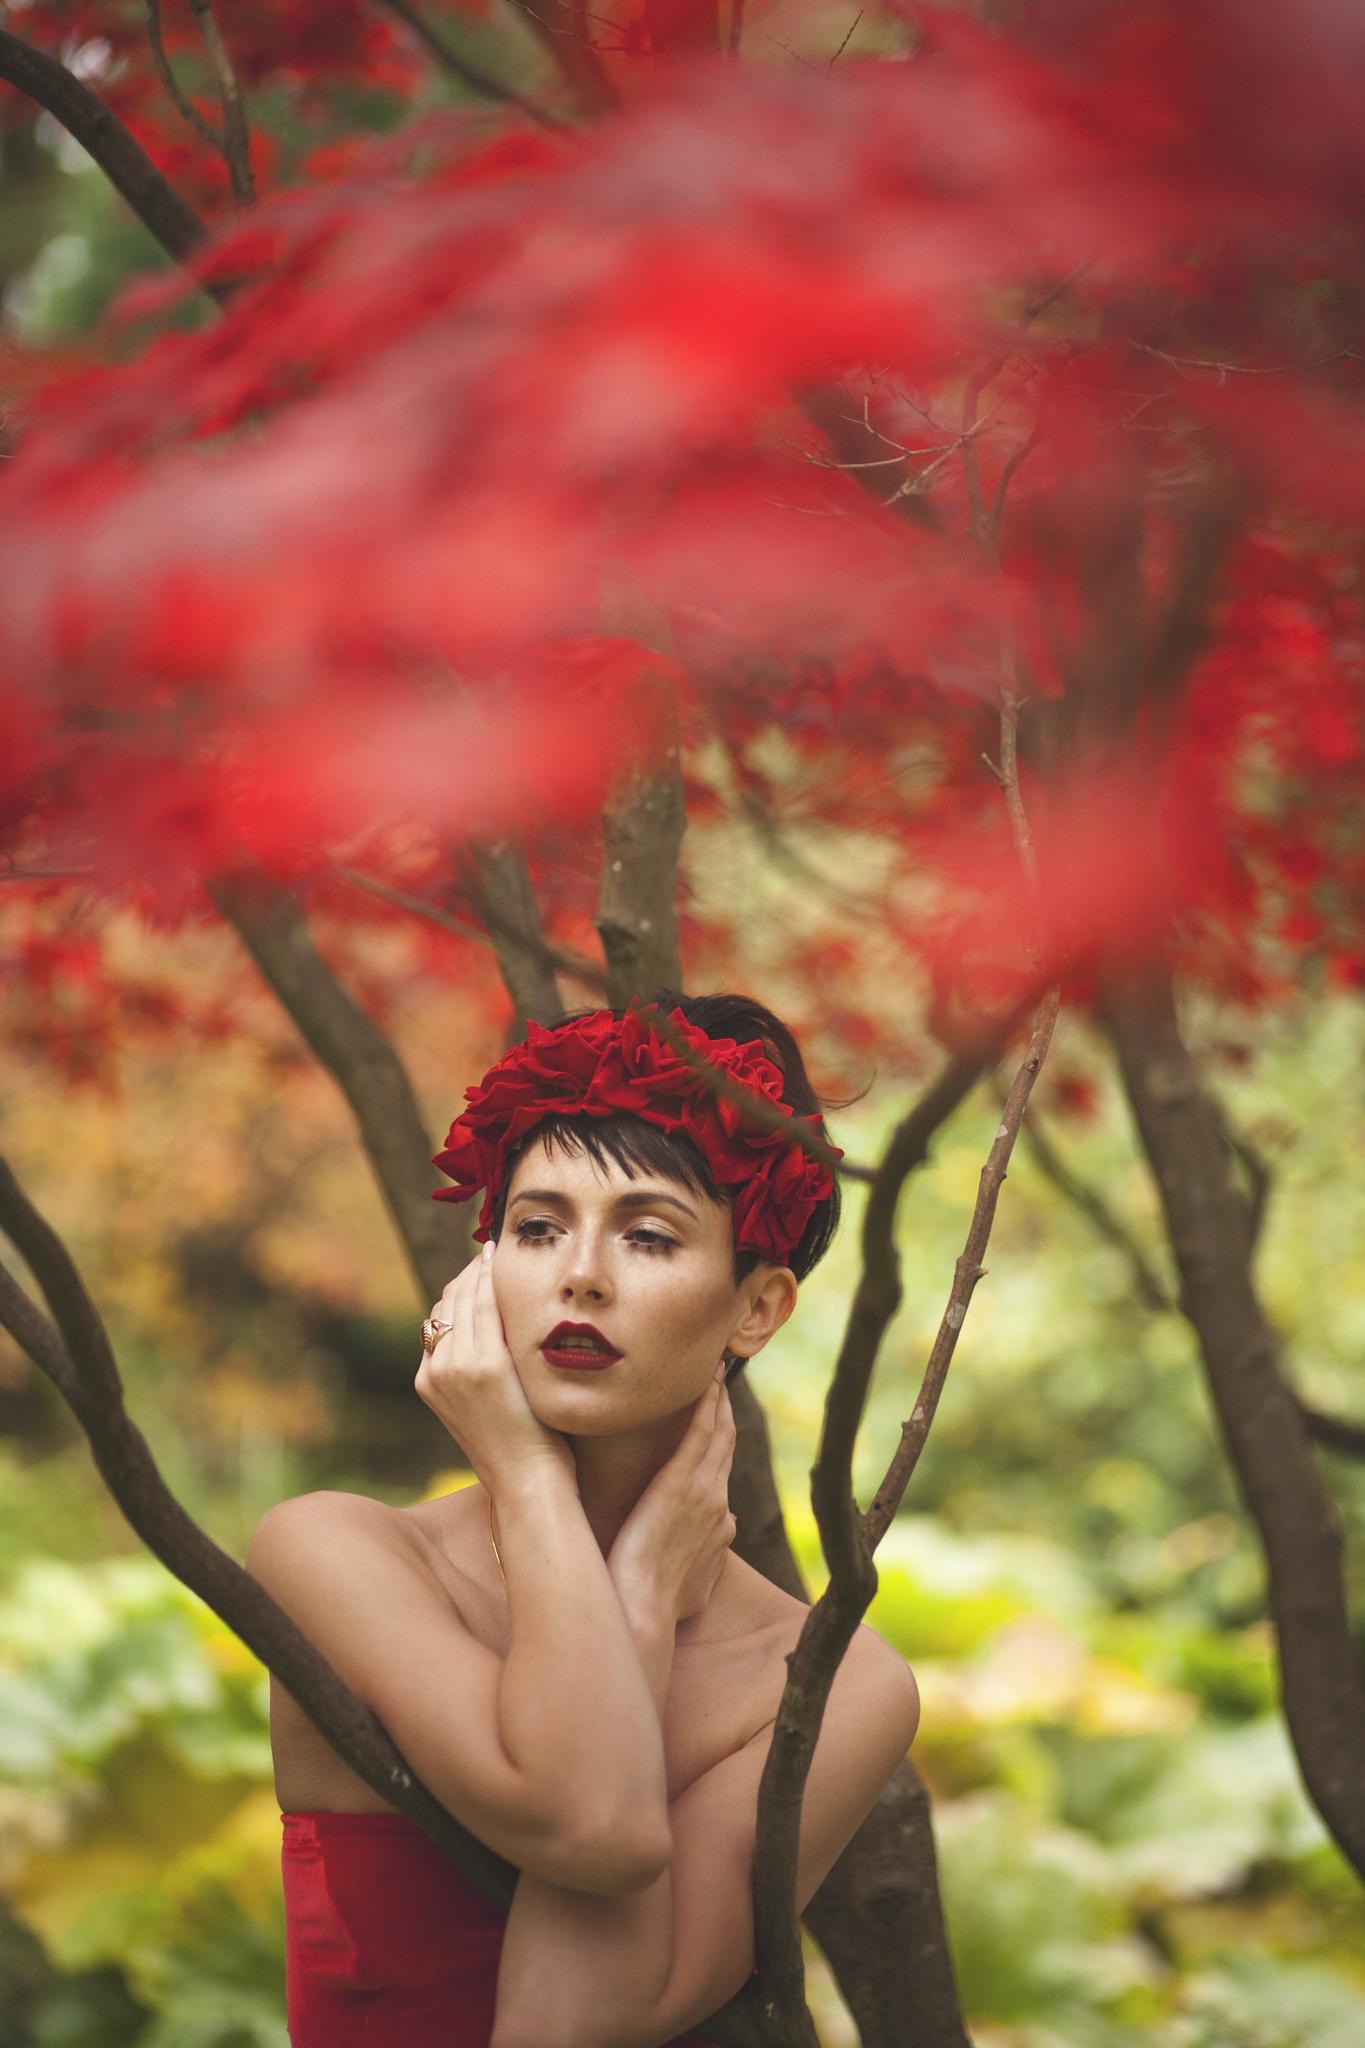 The Dreaming by Danniella Jaine